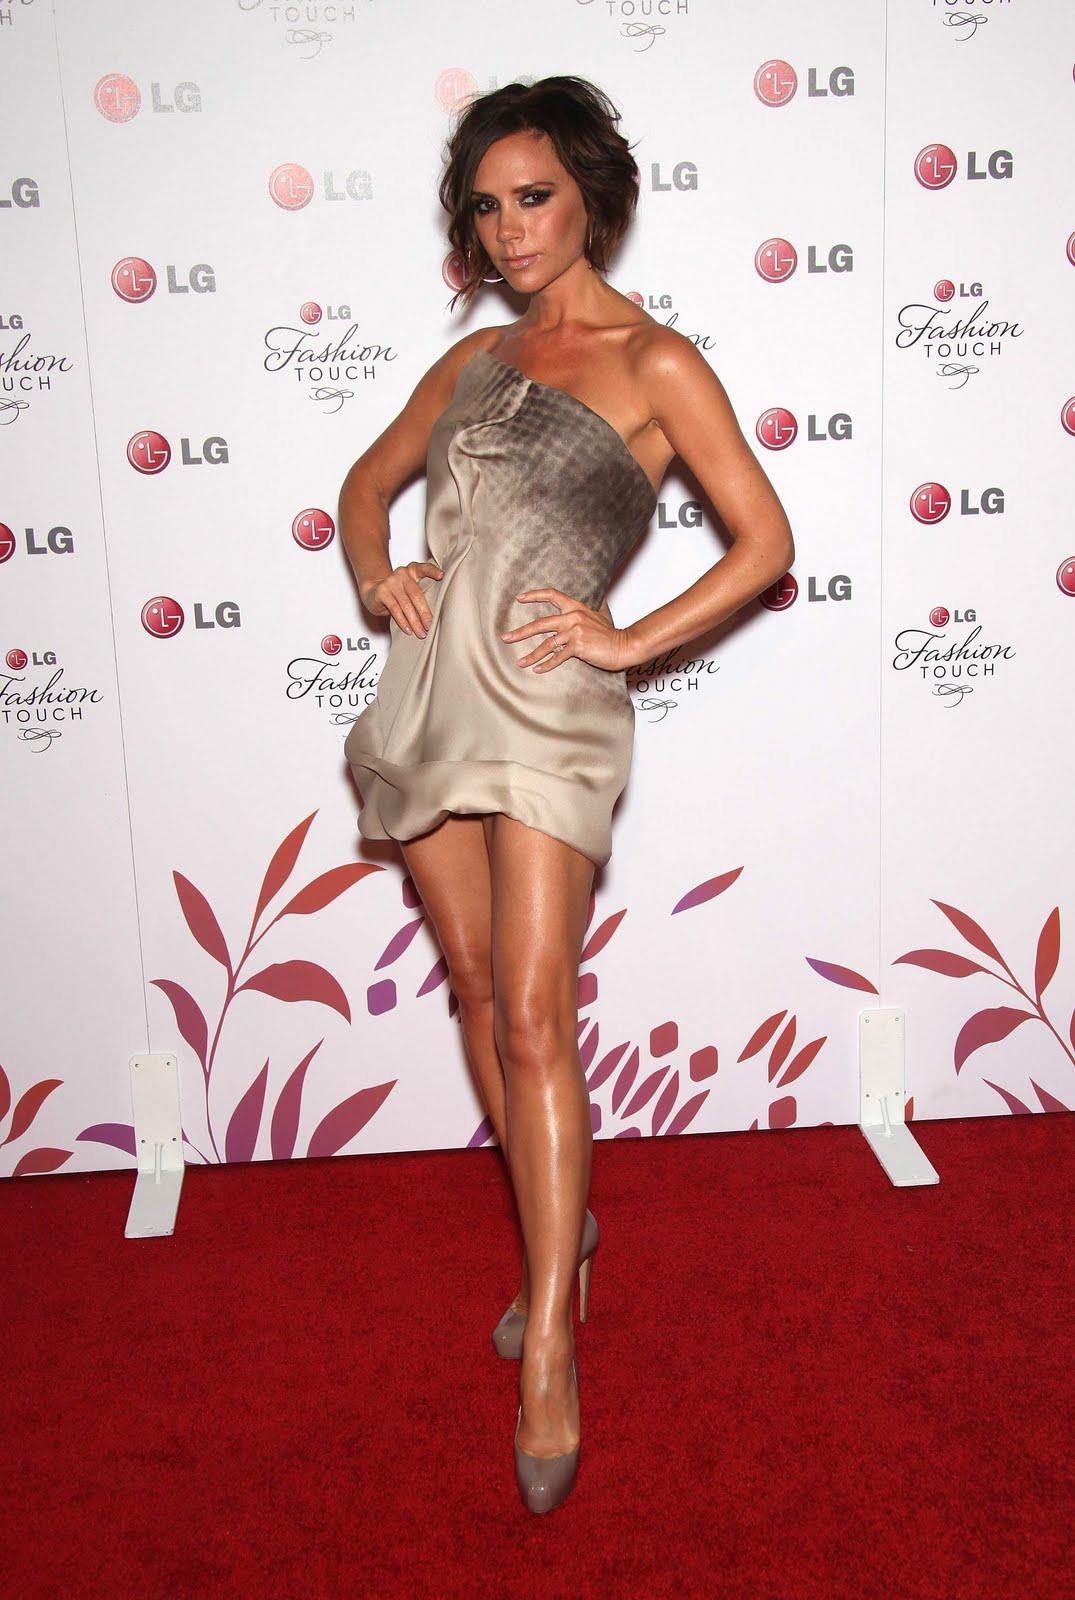 http://3.bp.blogspot.com/_9dA_x389xoo/TAPXJgtzw_I/AAAAAAAAF3U/PVYcl80uG94/s1600/Eva+Longoria+and+Victoria+Beckham562.jpg